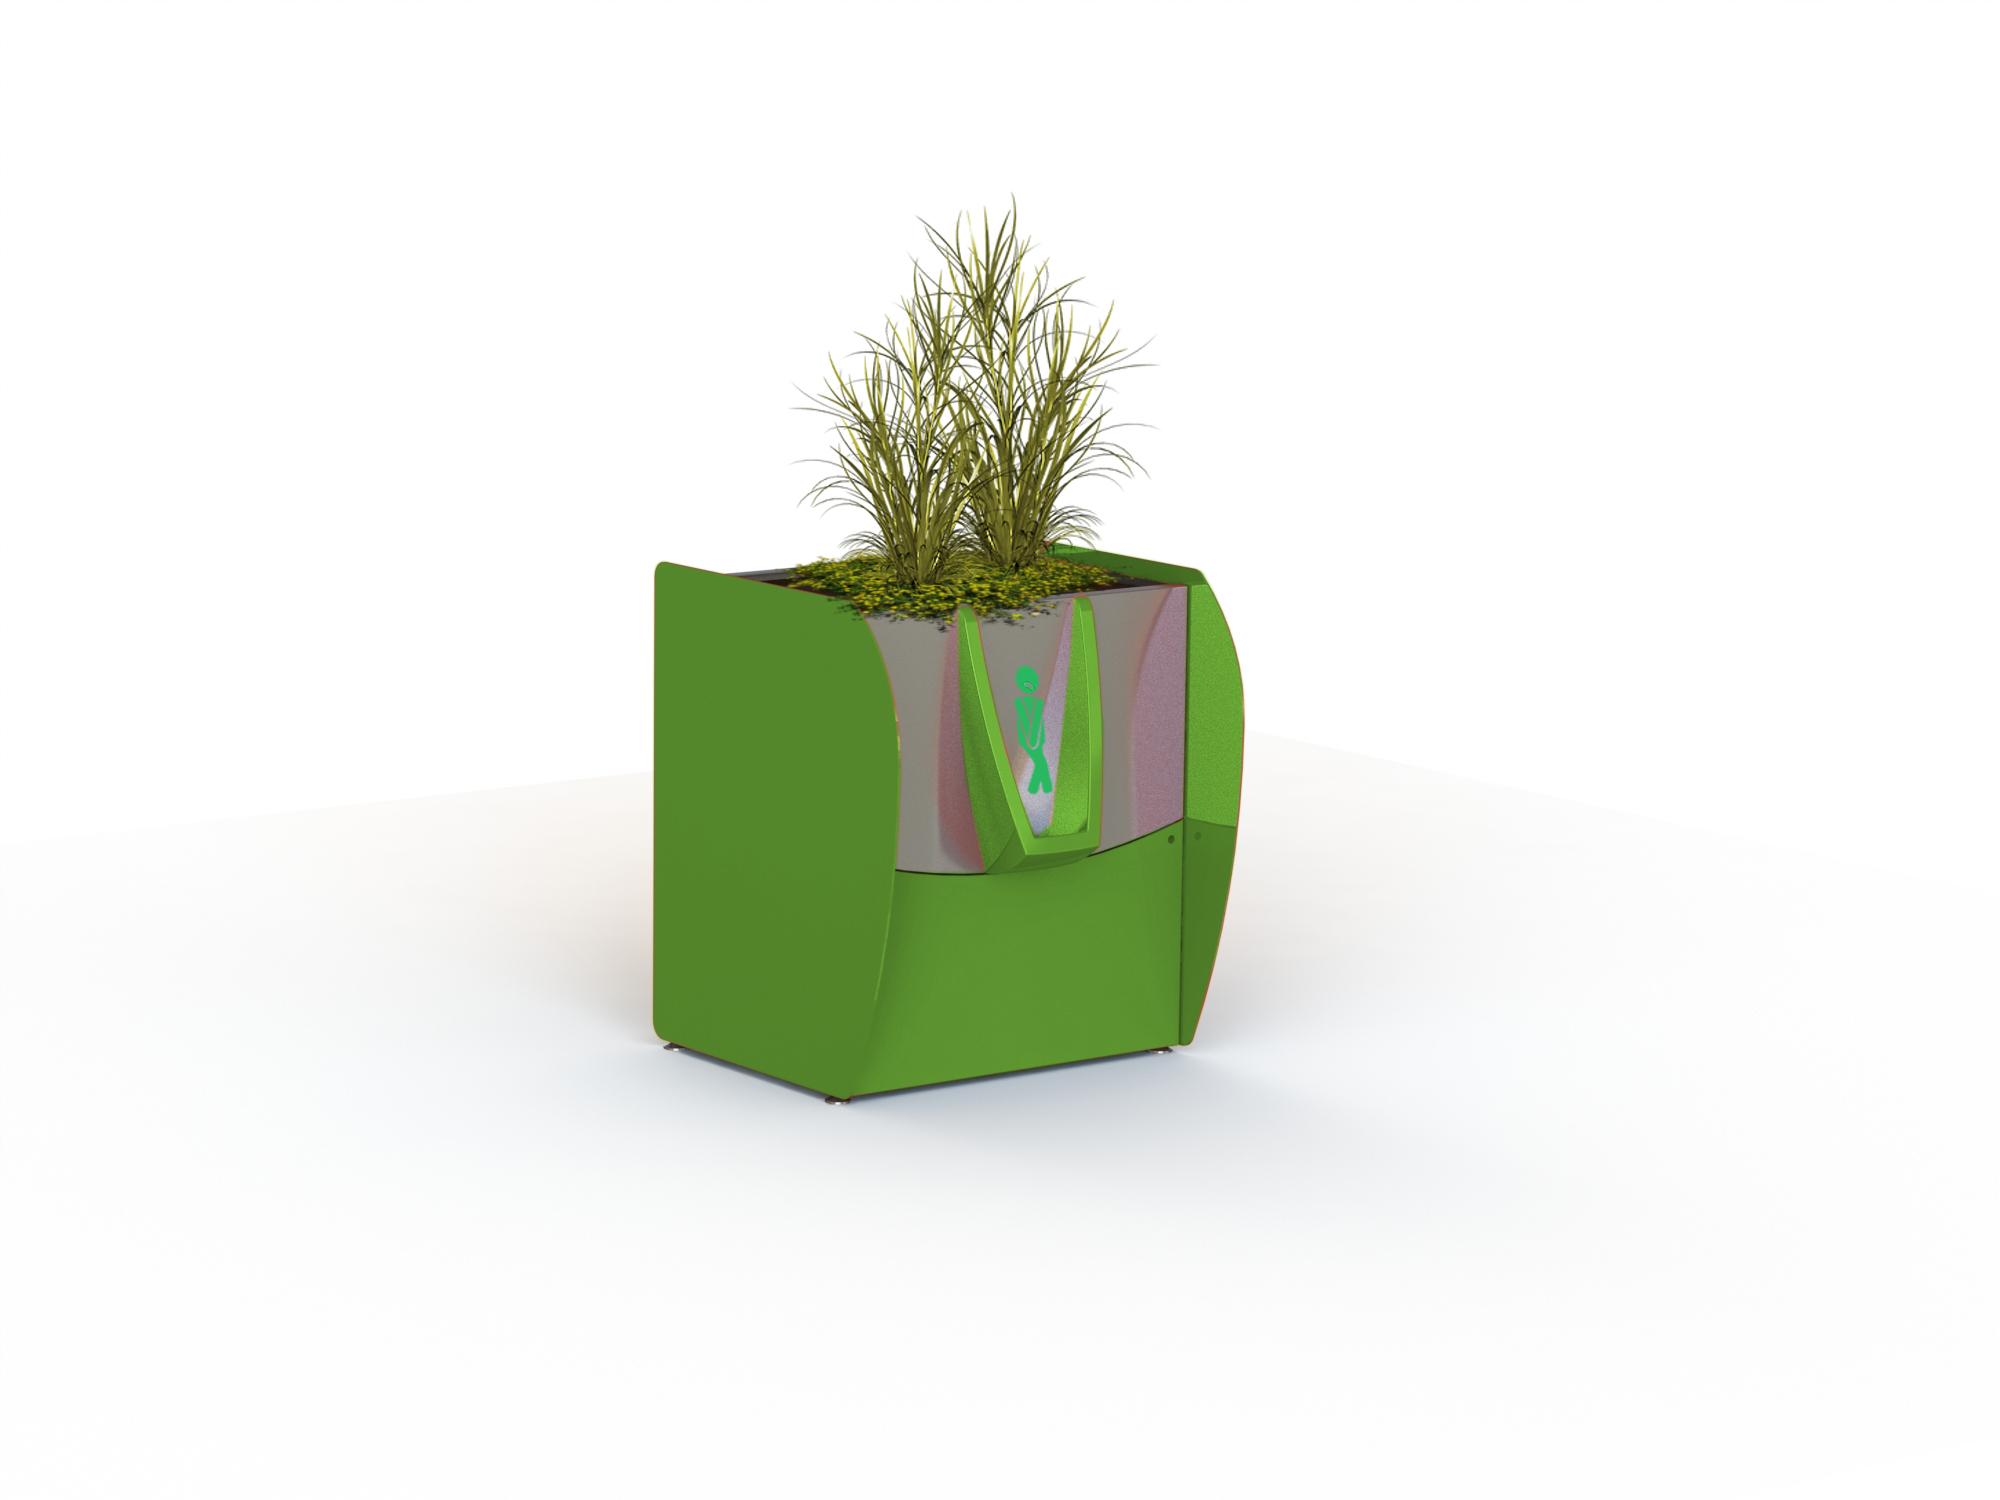 https://greenpee.nl/wp-content/uploads/2018/07/foto-stap-3-1.jpg